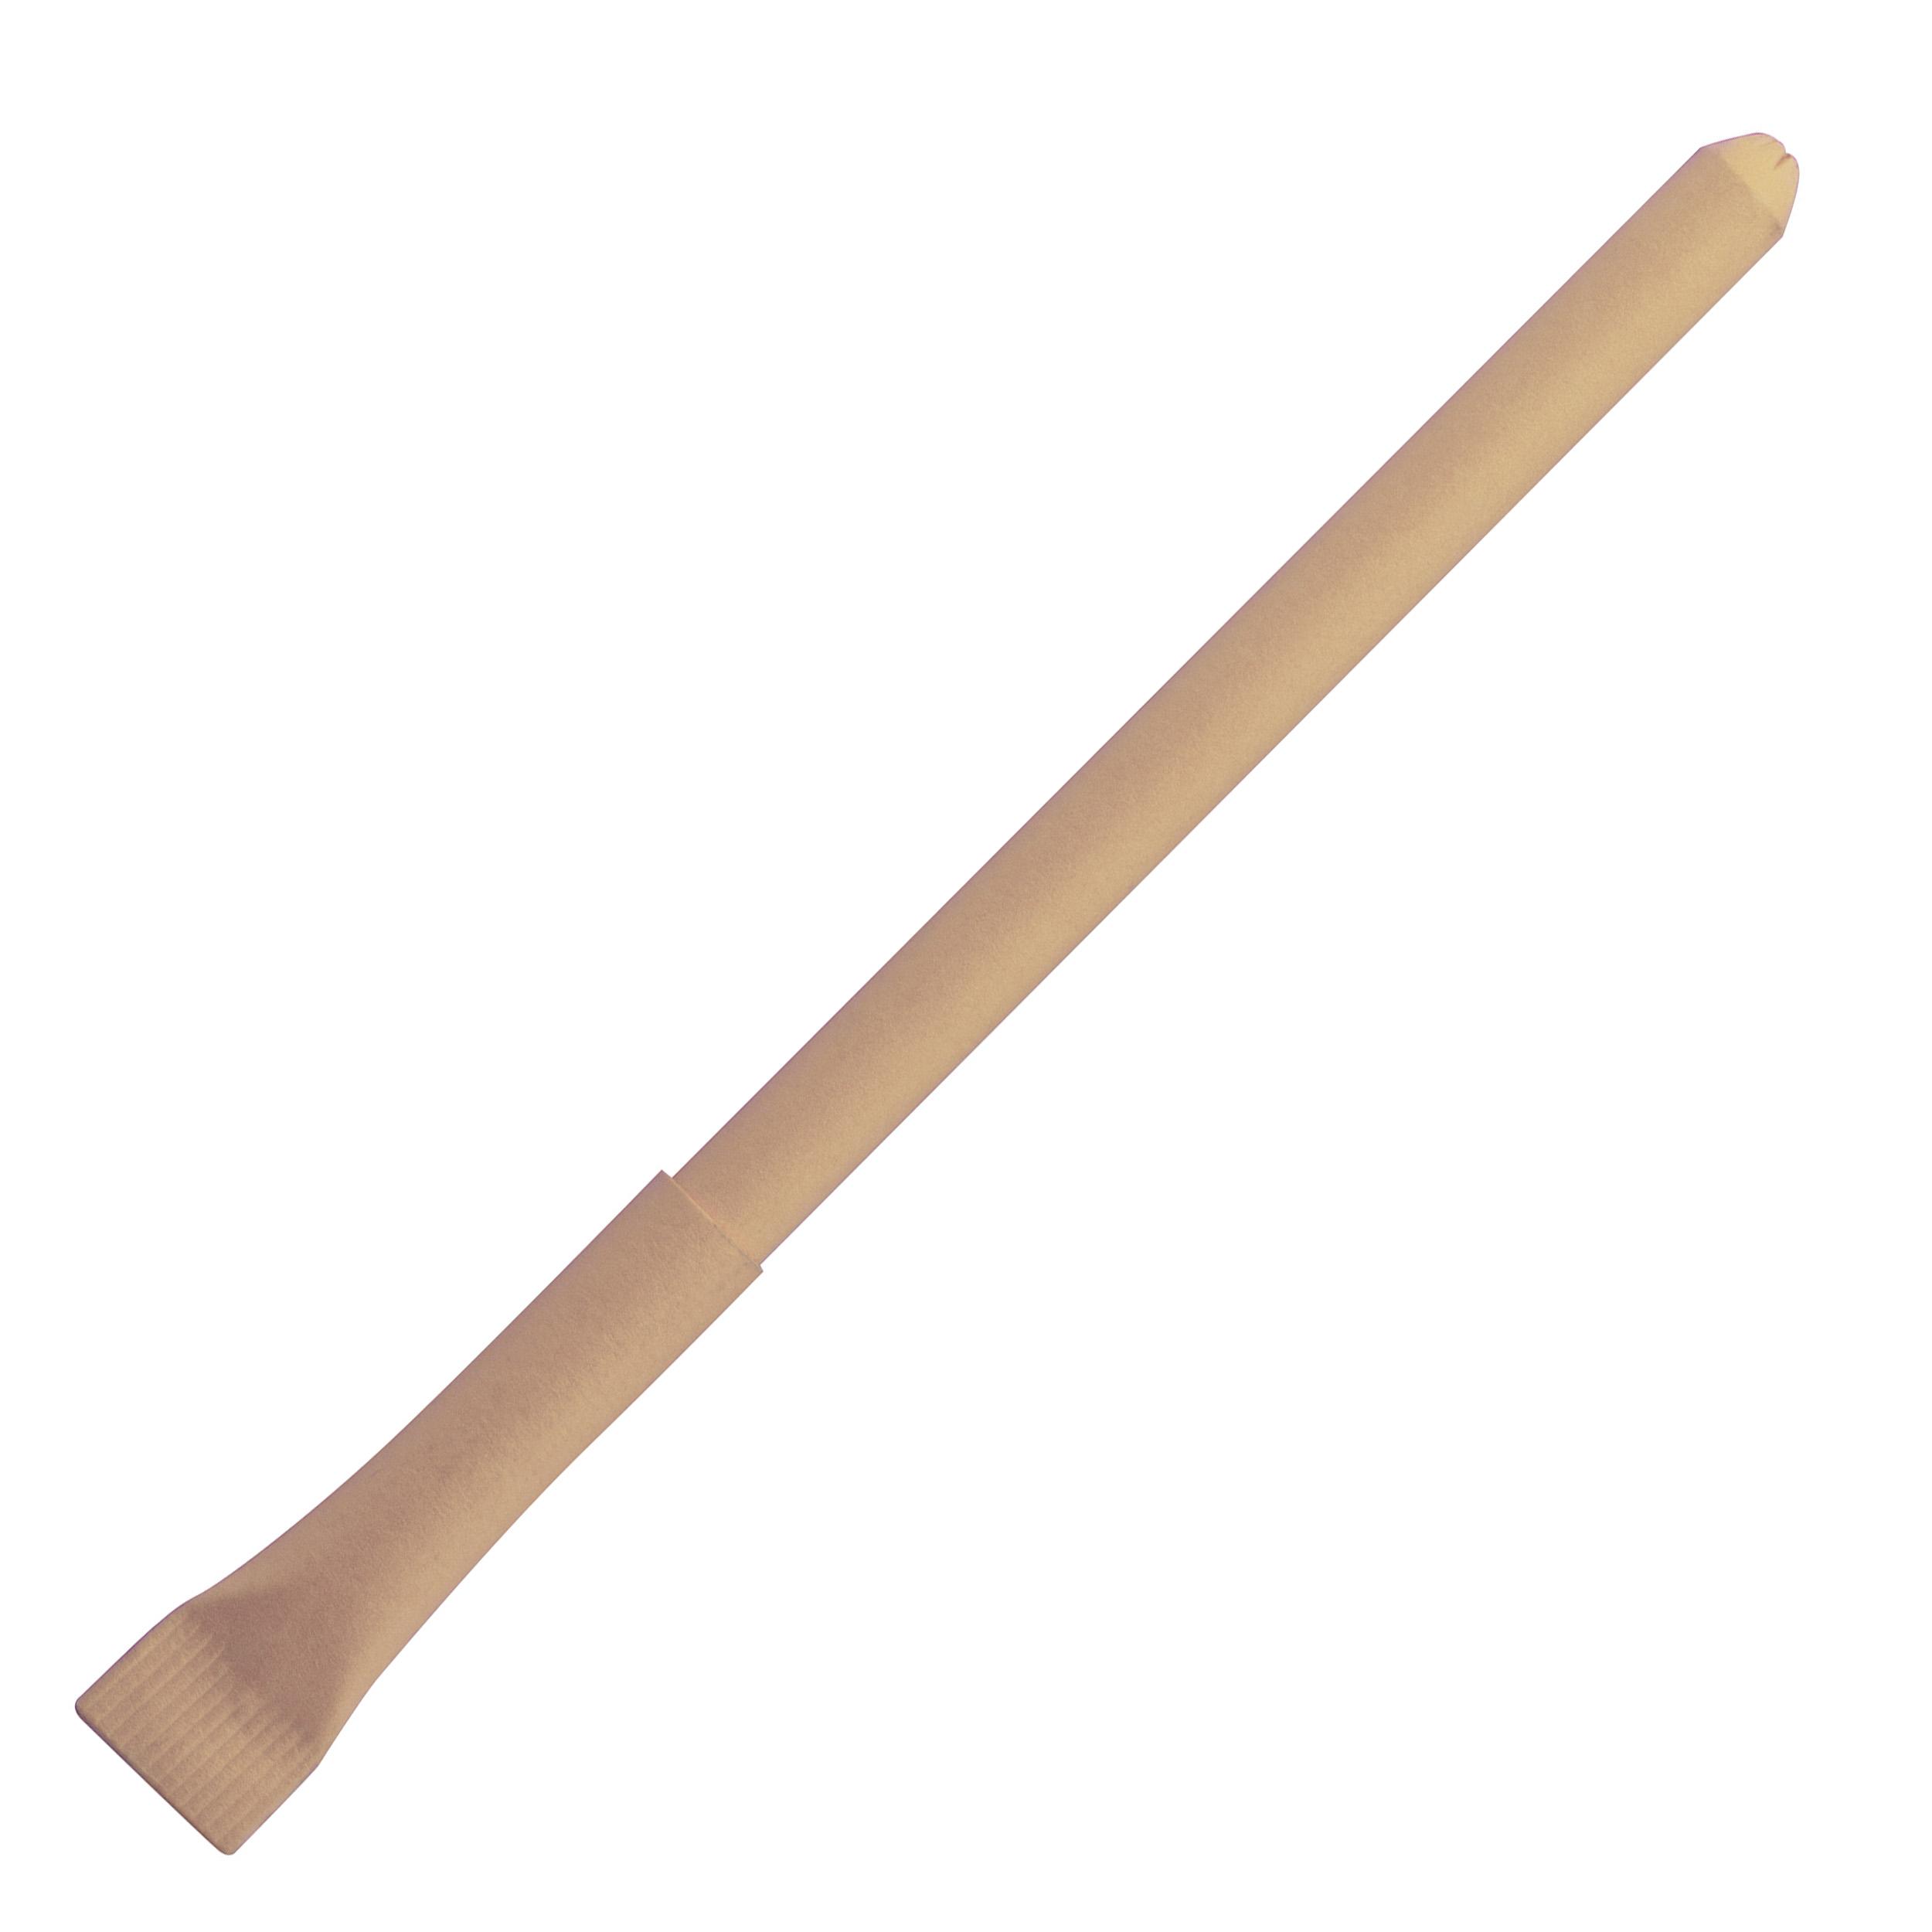 Carboard pen